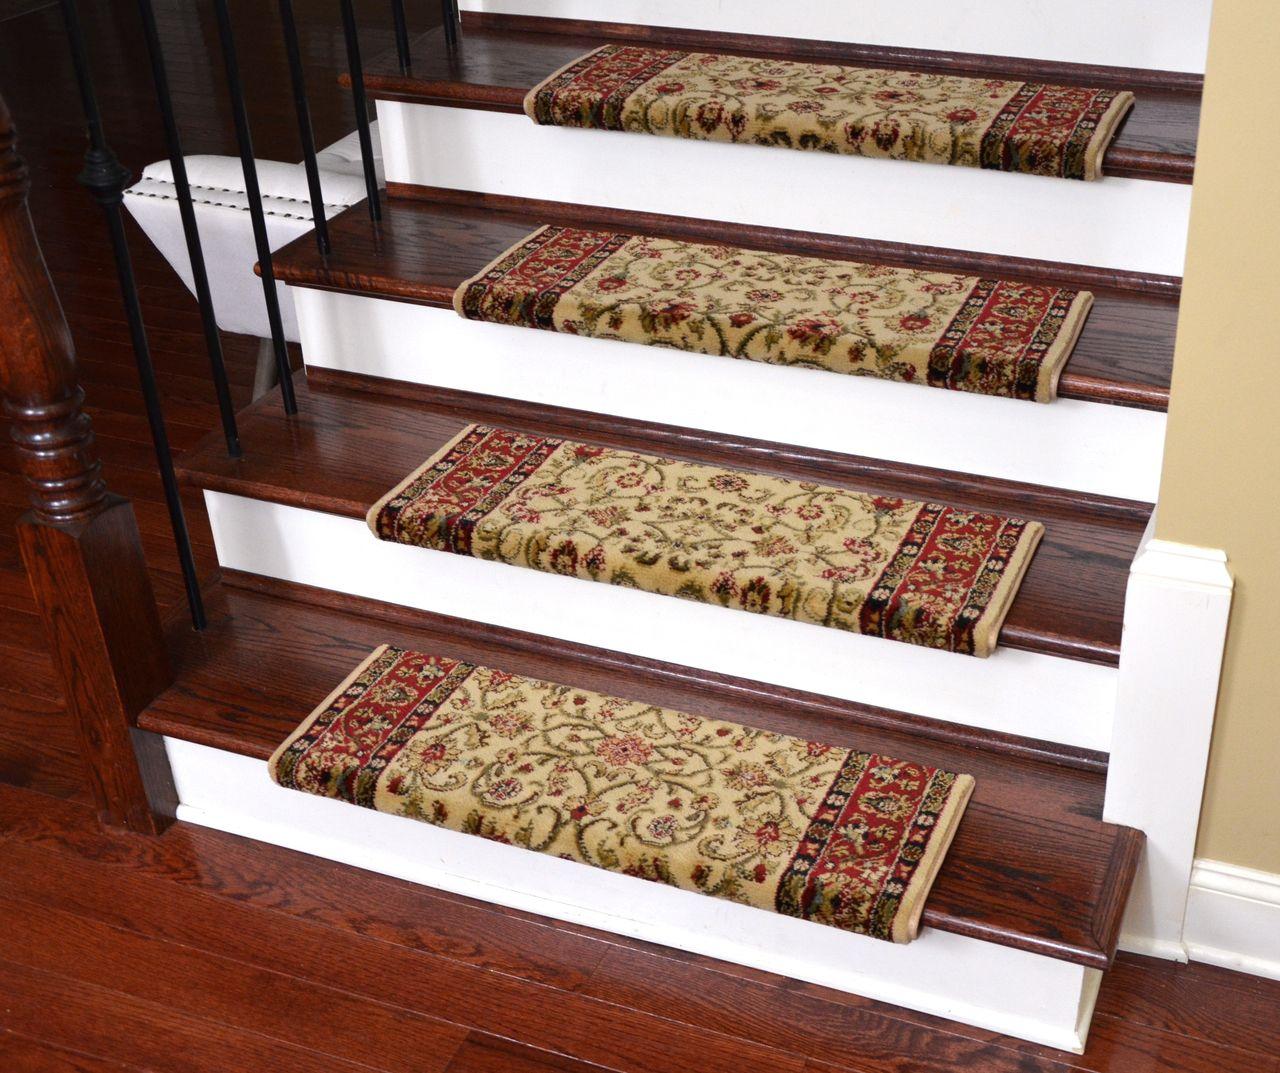 Dean Non Slip Tape Free Pet Friendly Stair Gripper   Non Slip Carpet Stair Nosing